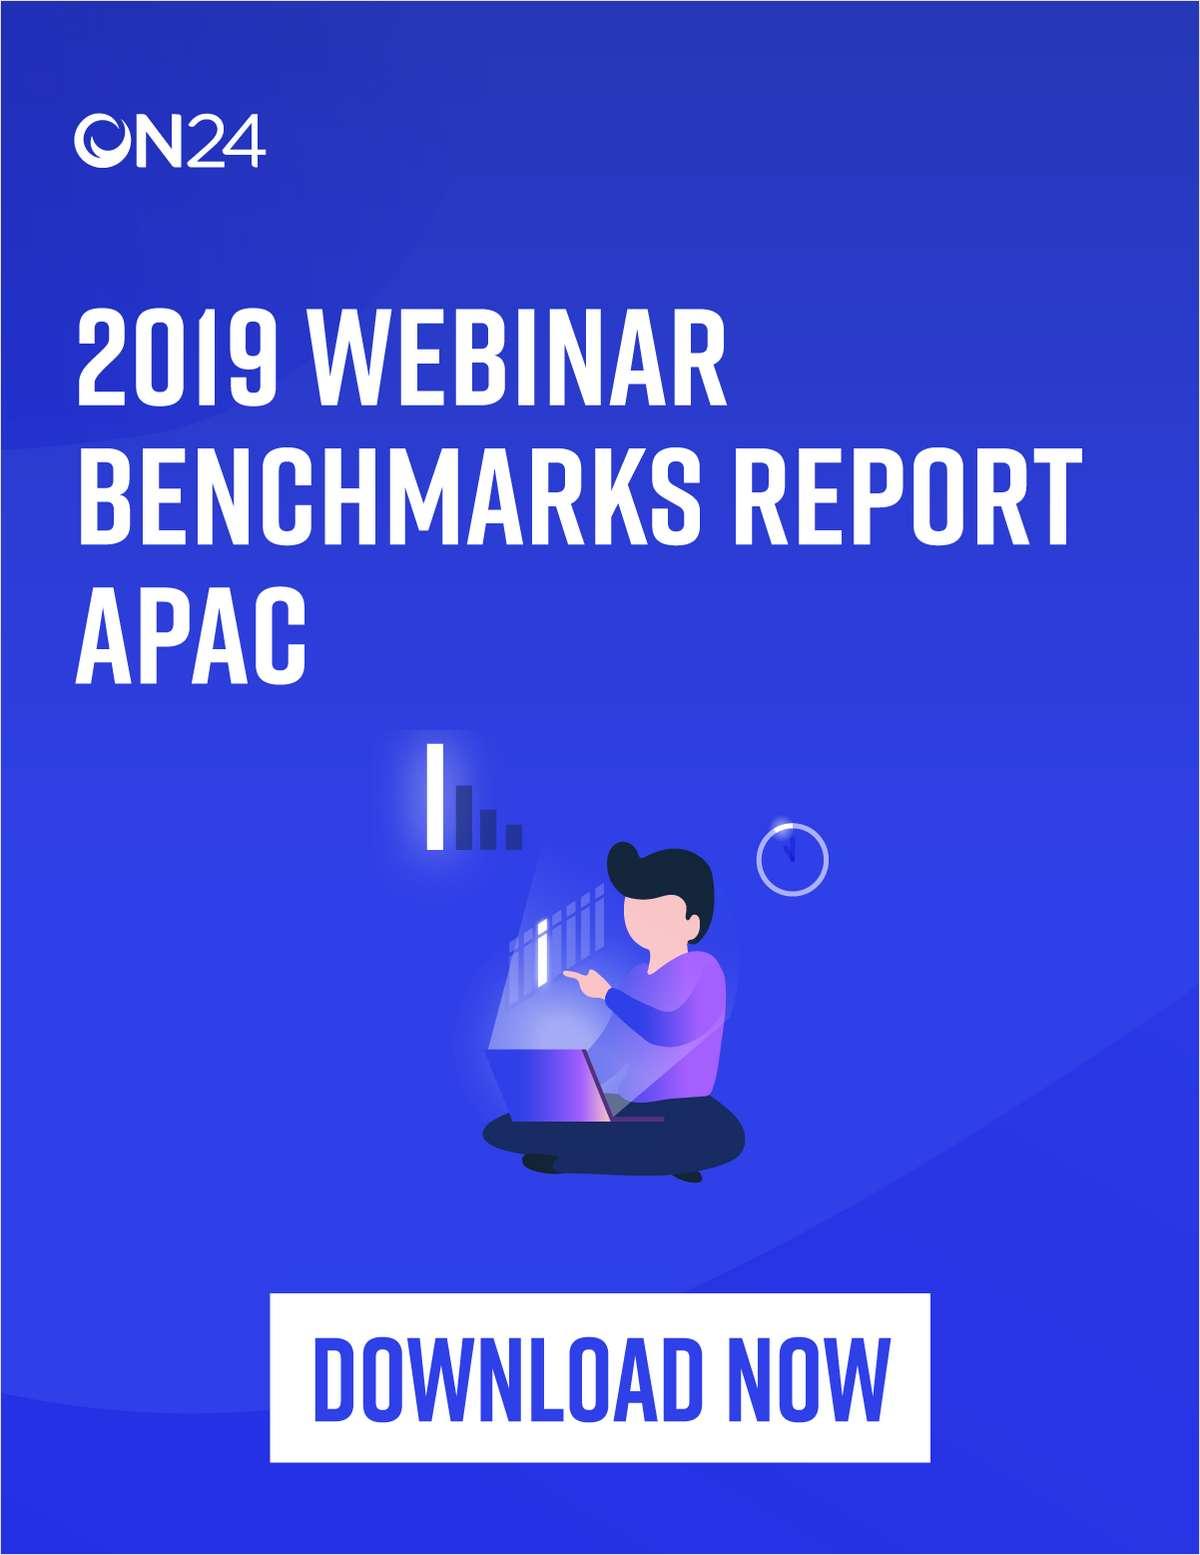 APAC Webinar Benchmarks Report 2019